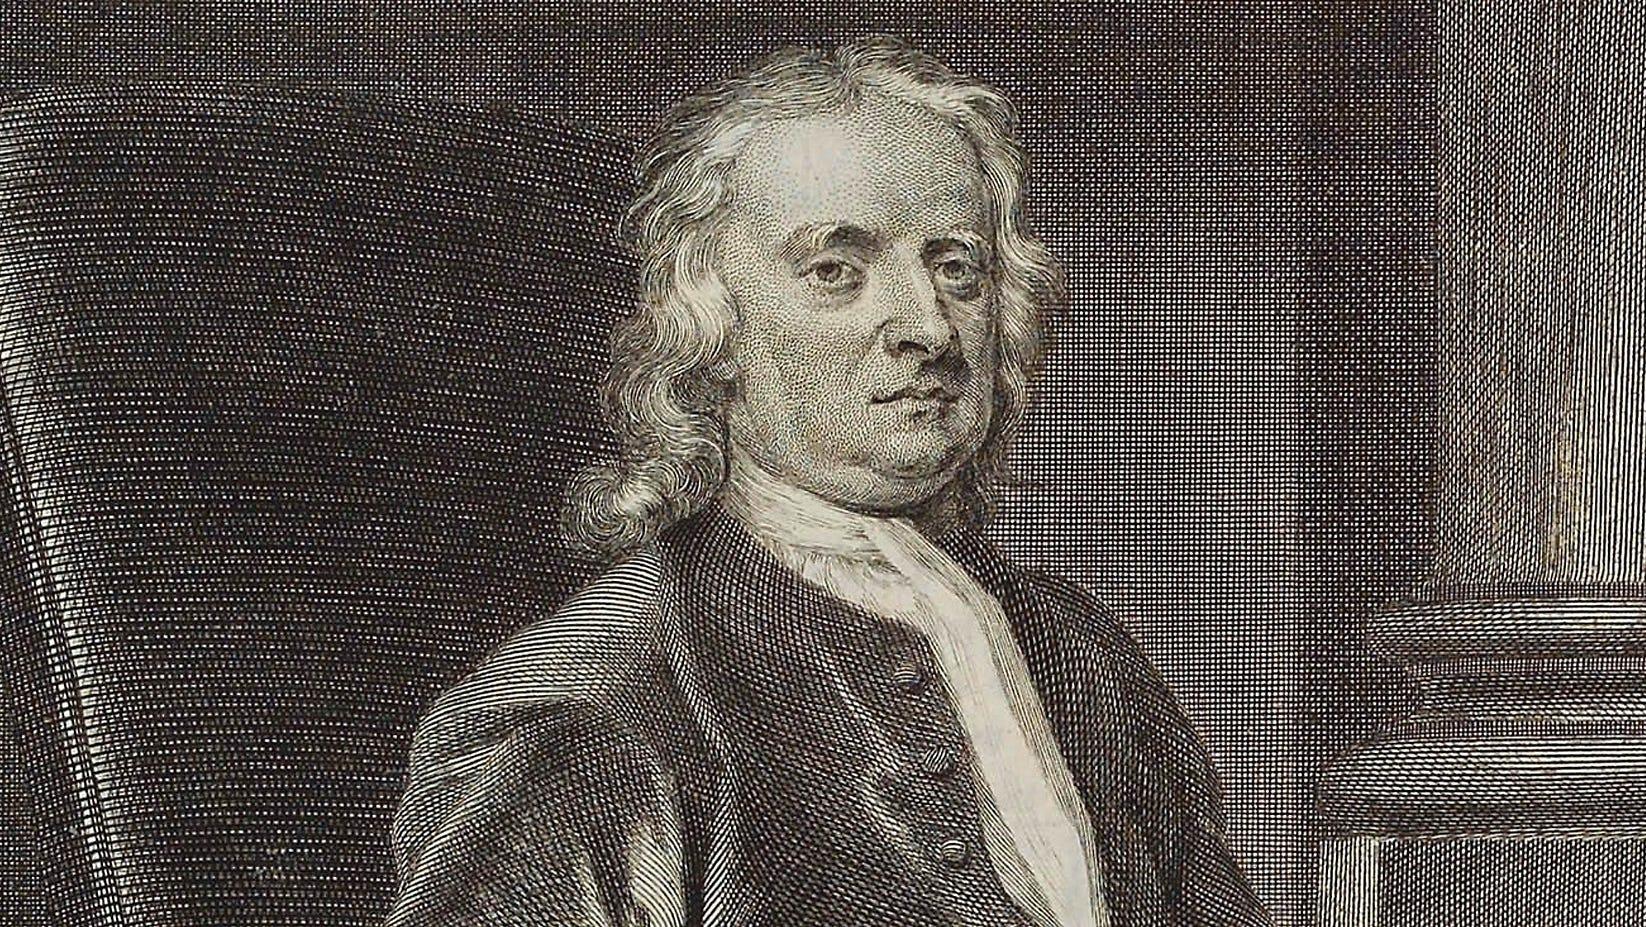 Sir Isaac Newton in a 1726 painting by John Vanderbank.